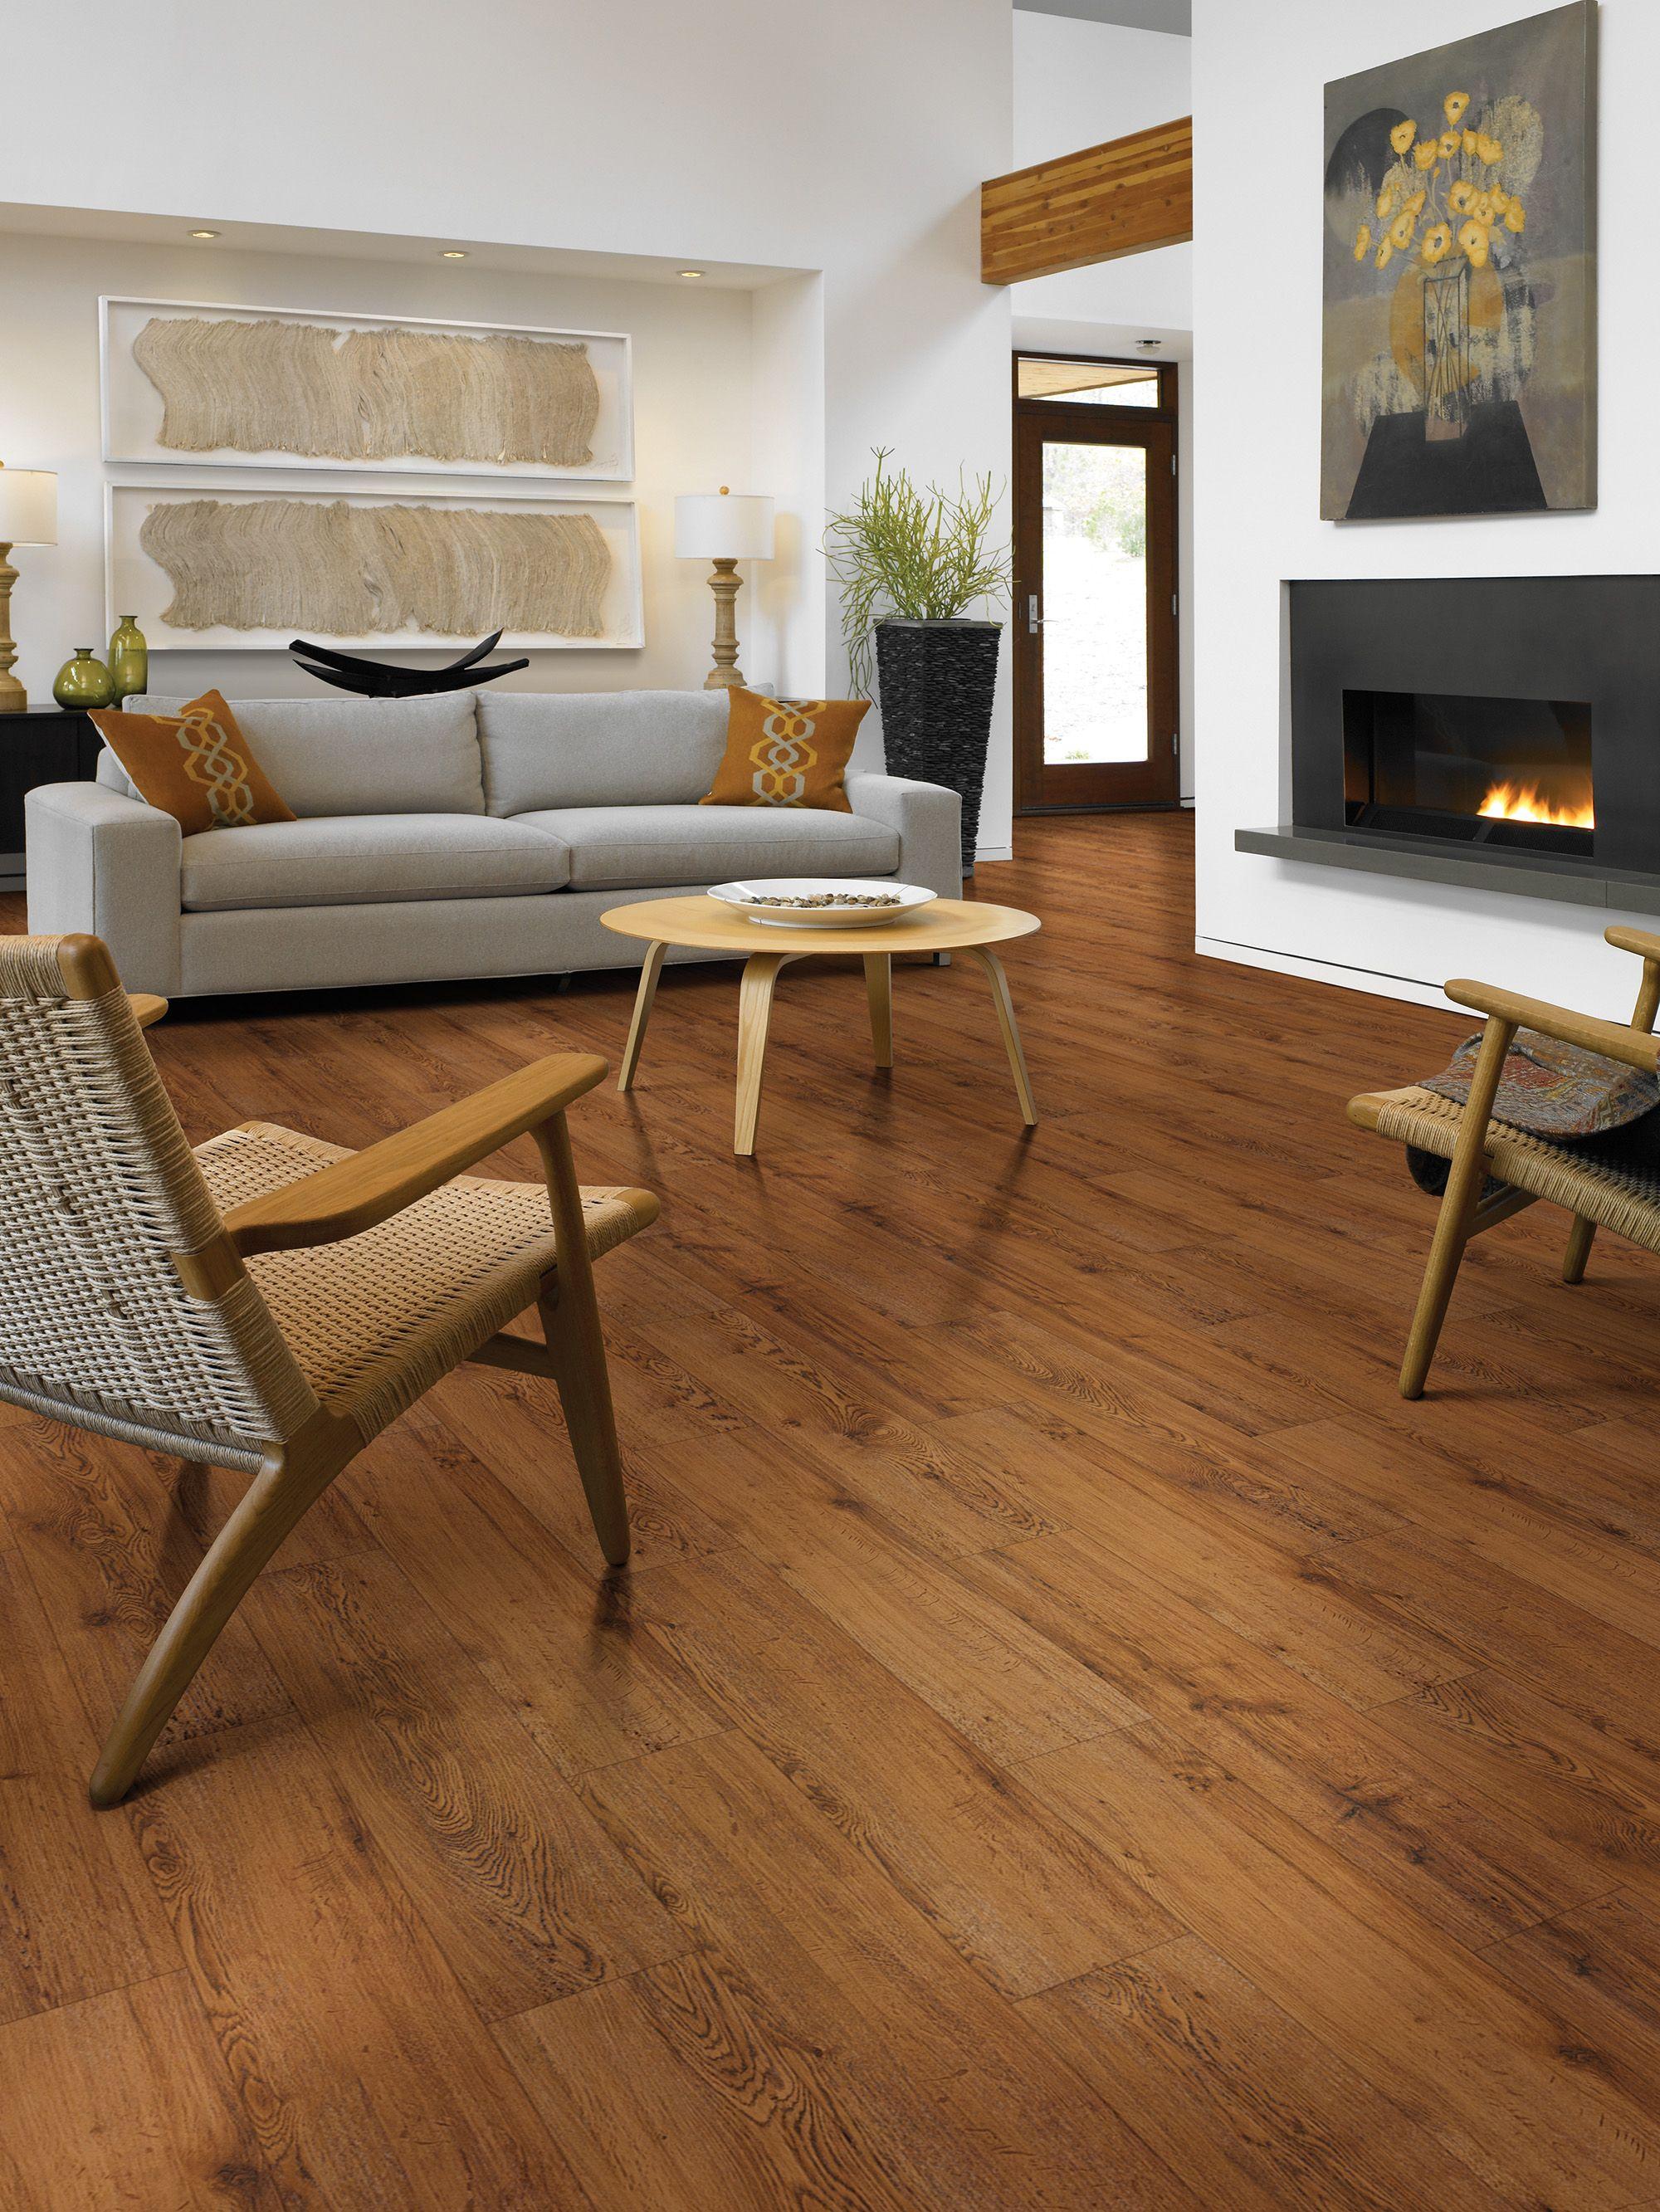 Sumter Plank LVT Flooring in the color Gunstock Oak